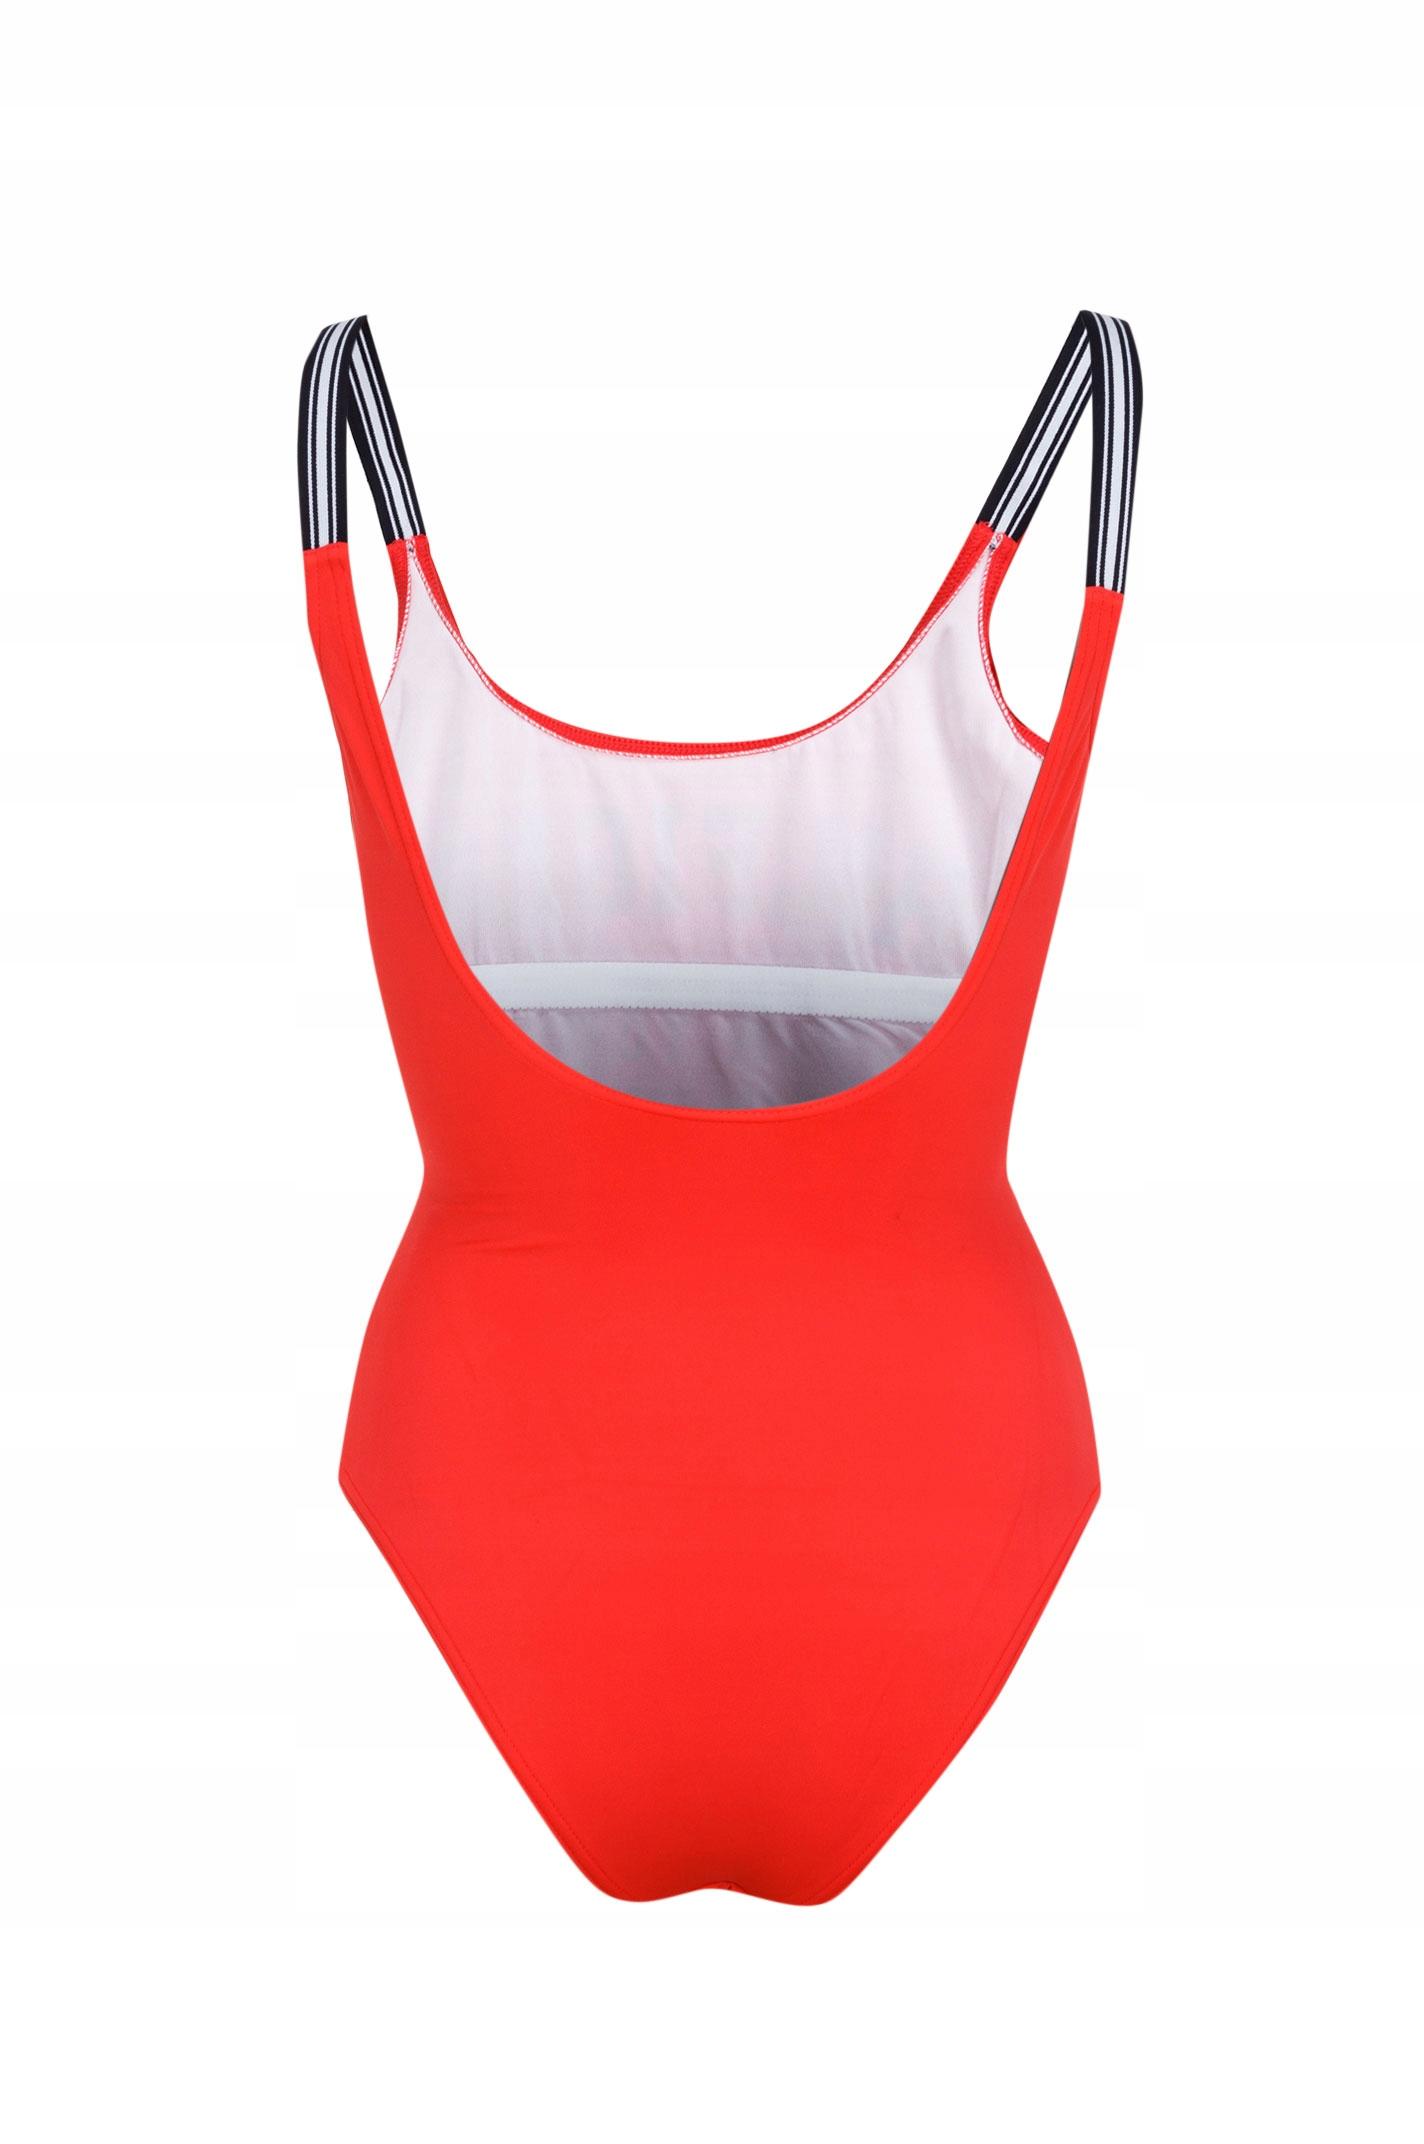 83736667a47add Kostium strój kąpielowy Tommy Hilfiger Clio Bath - 7802615614 ...